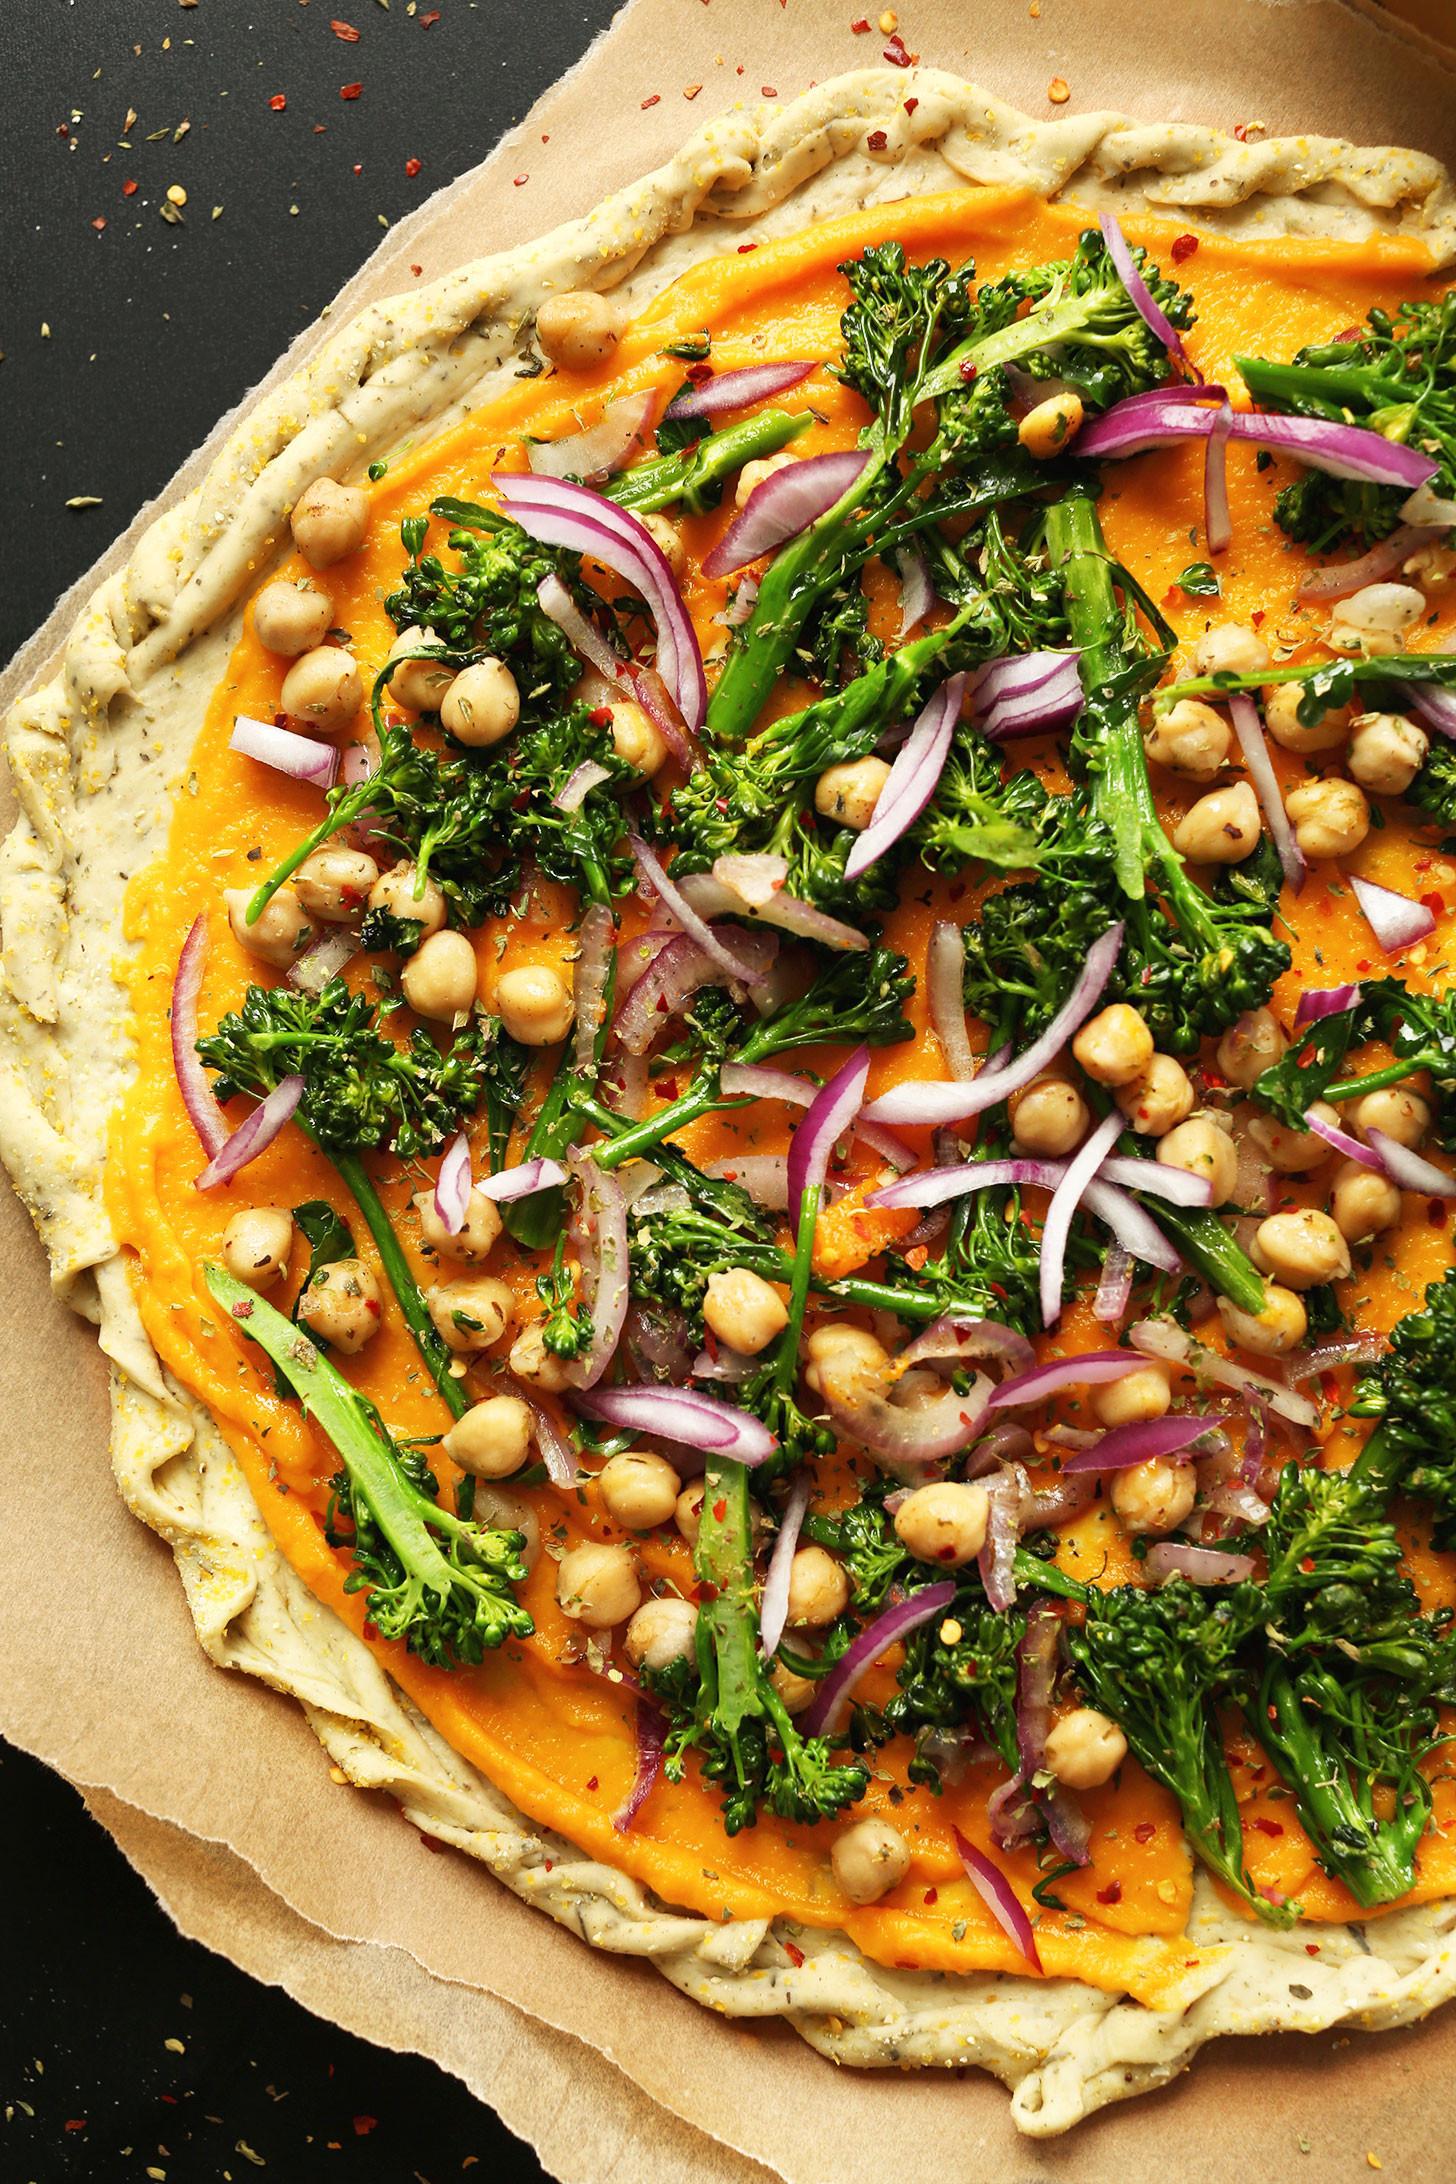 Healthy Vegan Dinners  30 delicious vegan dinner recipes for happy tummies